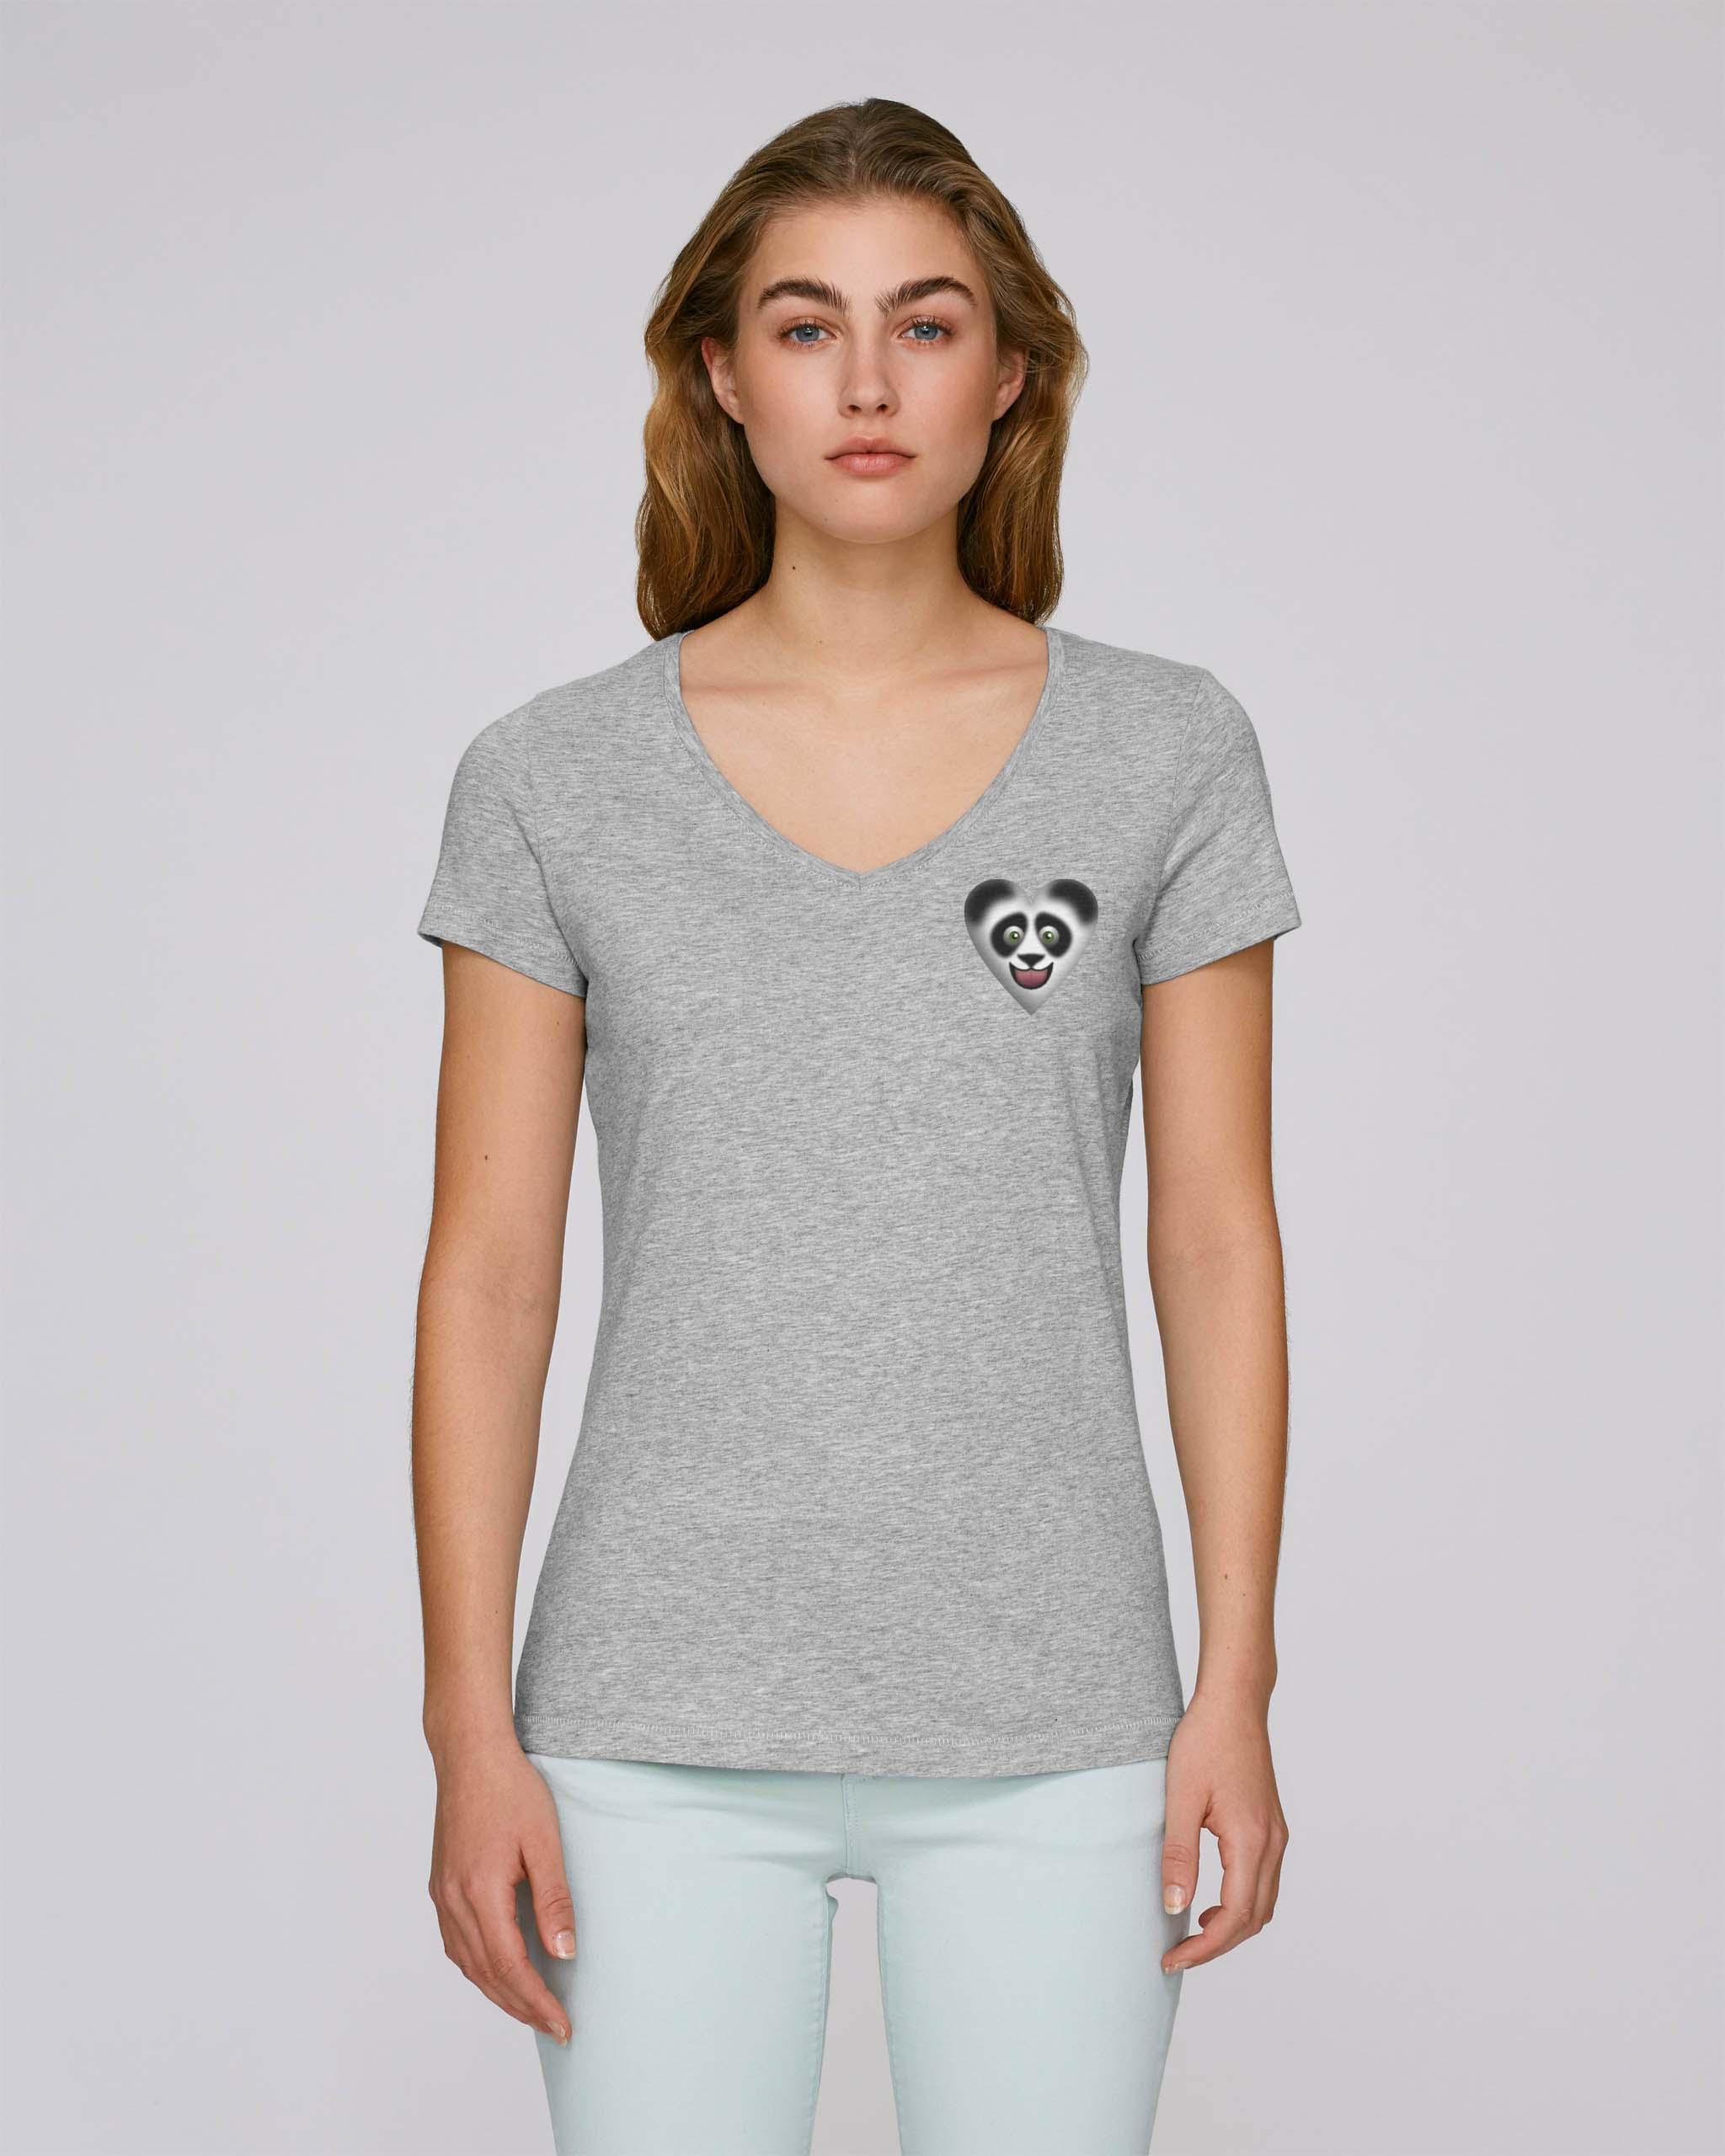 T-Shirt Bio gris clair Femme – Panda tee